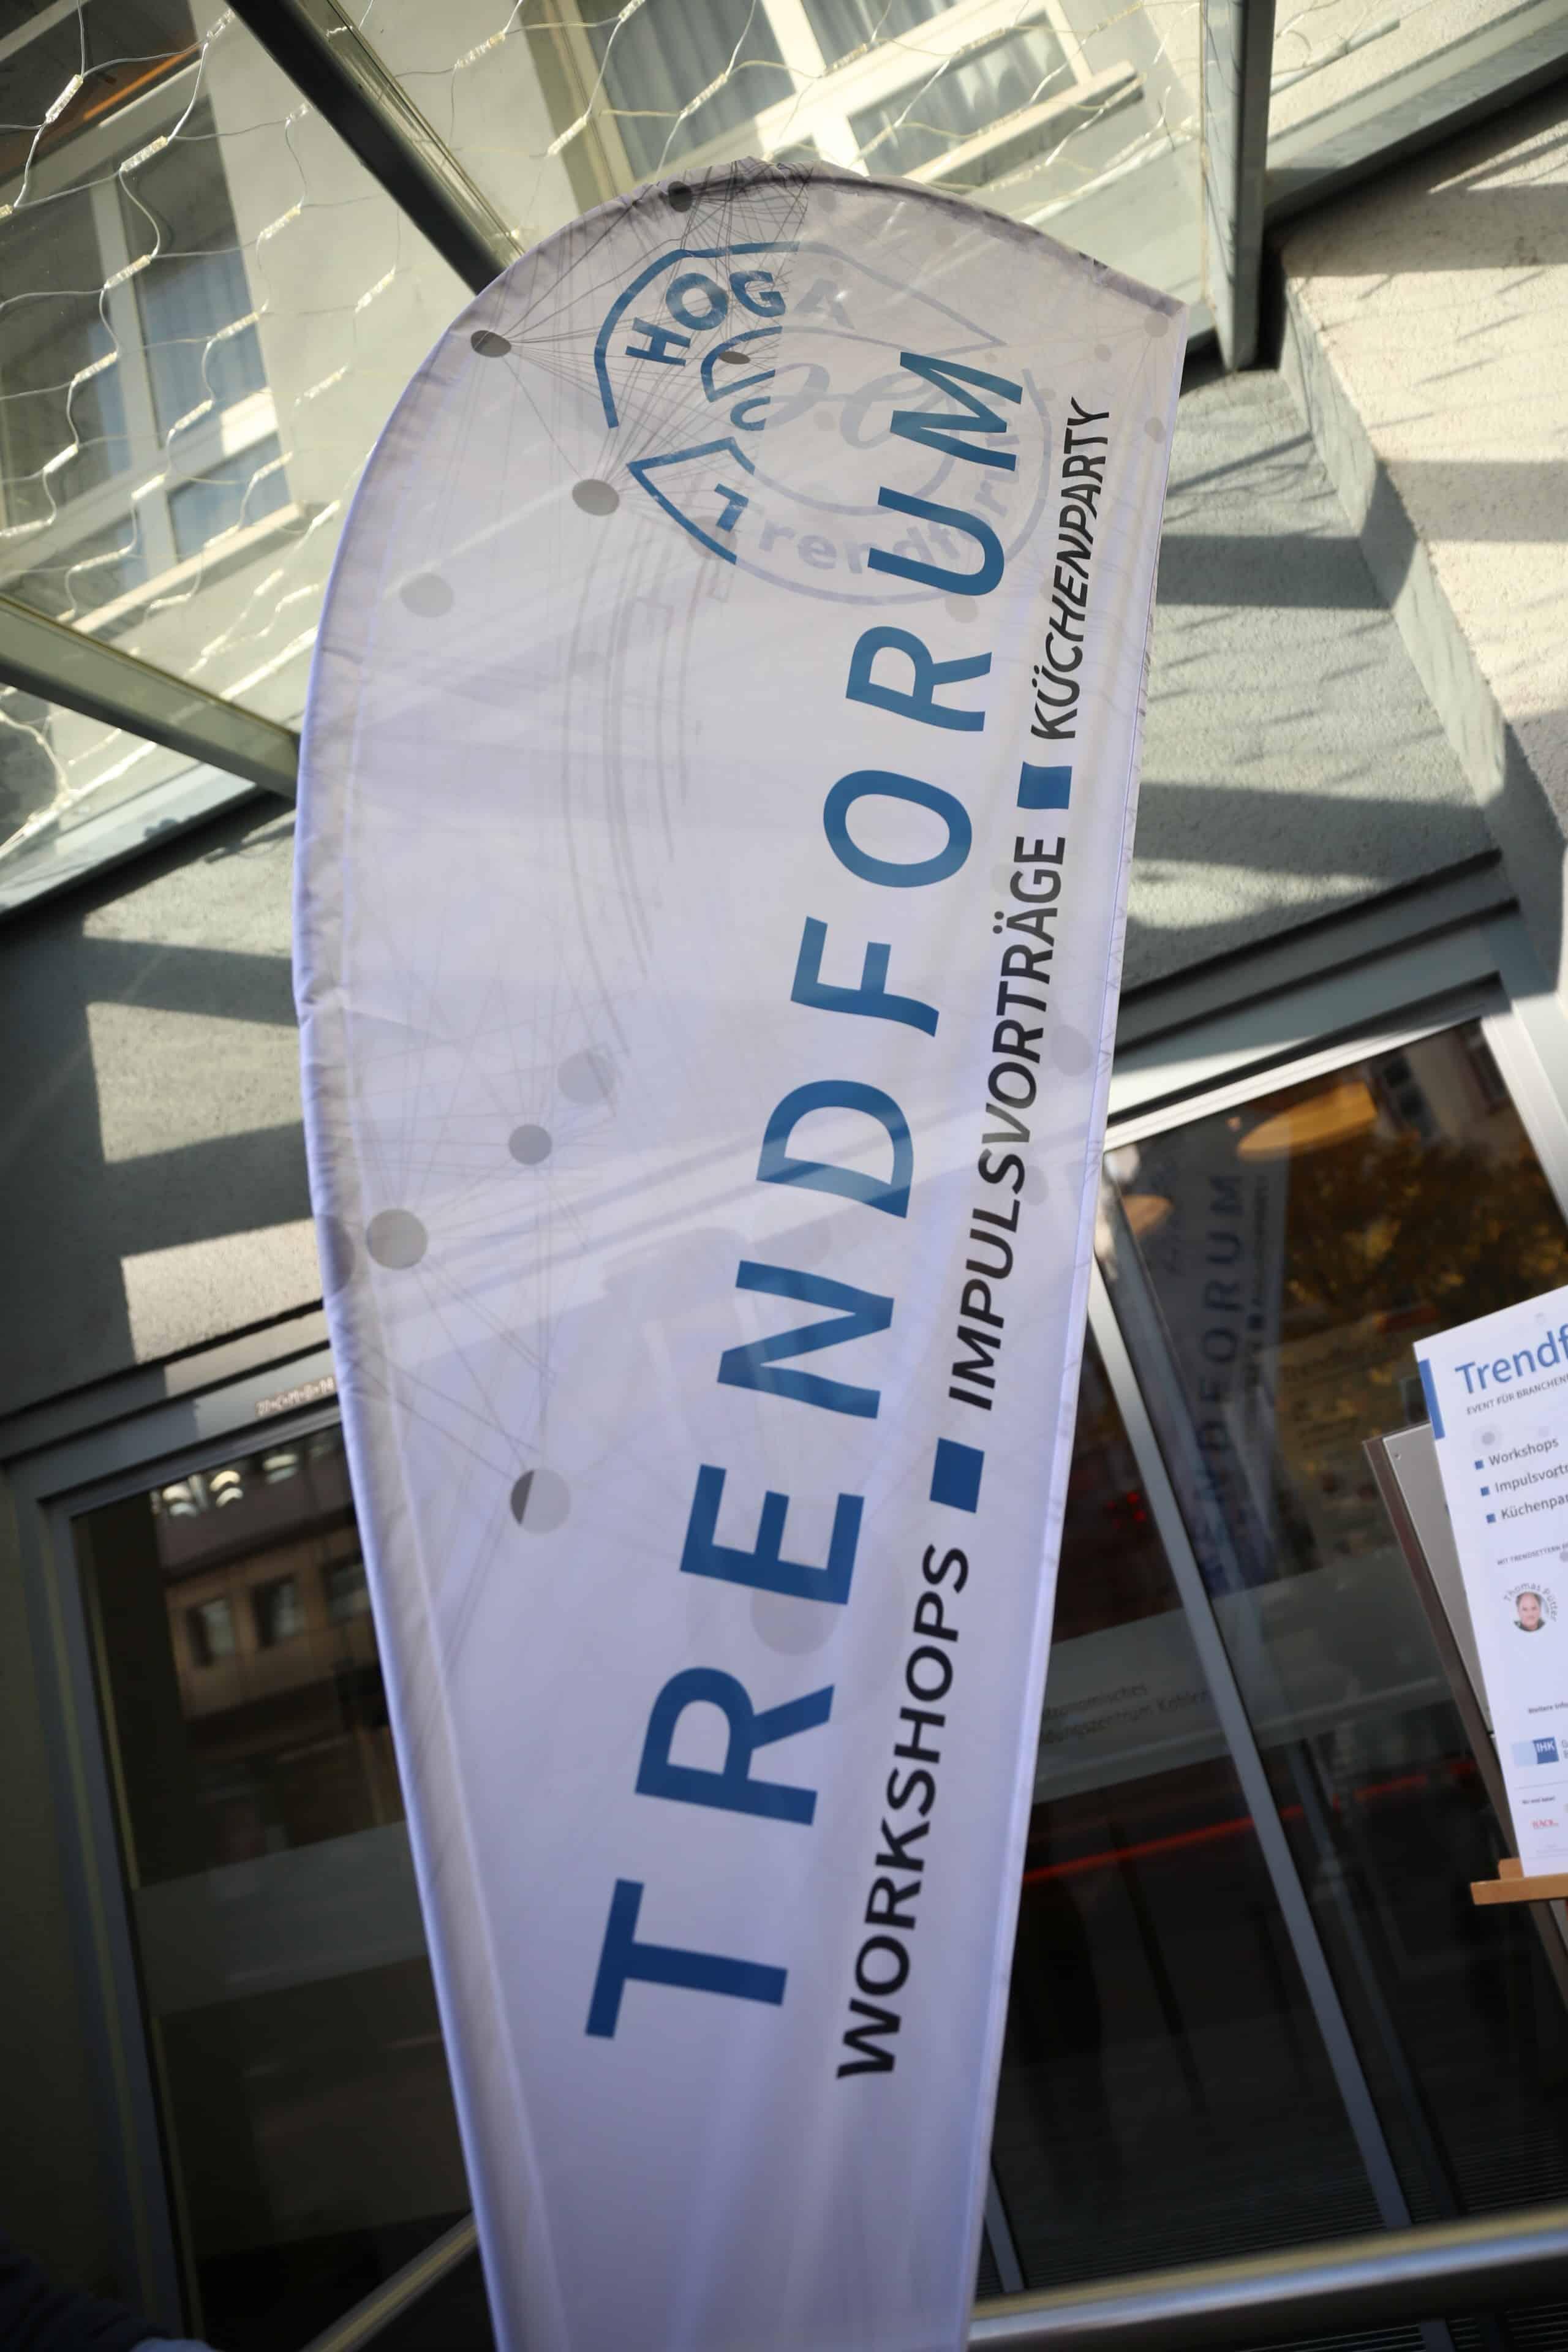 GBZ-Trendforum Hotellerie & Gastronomie